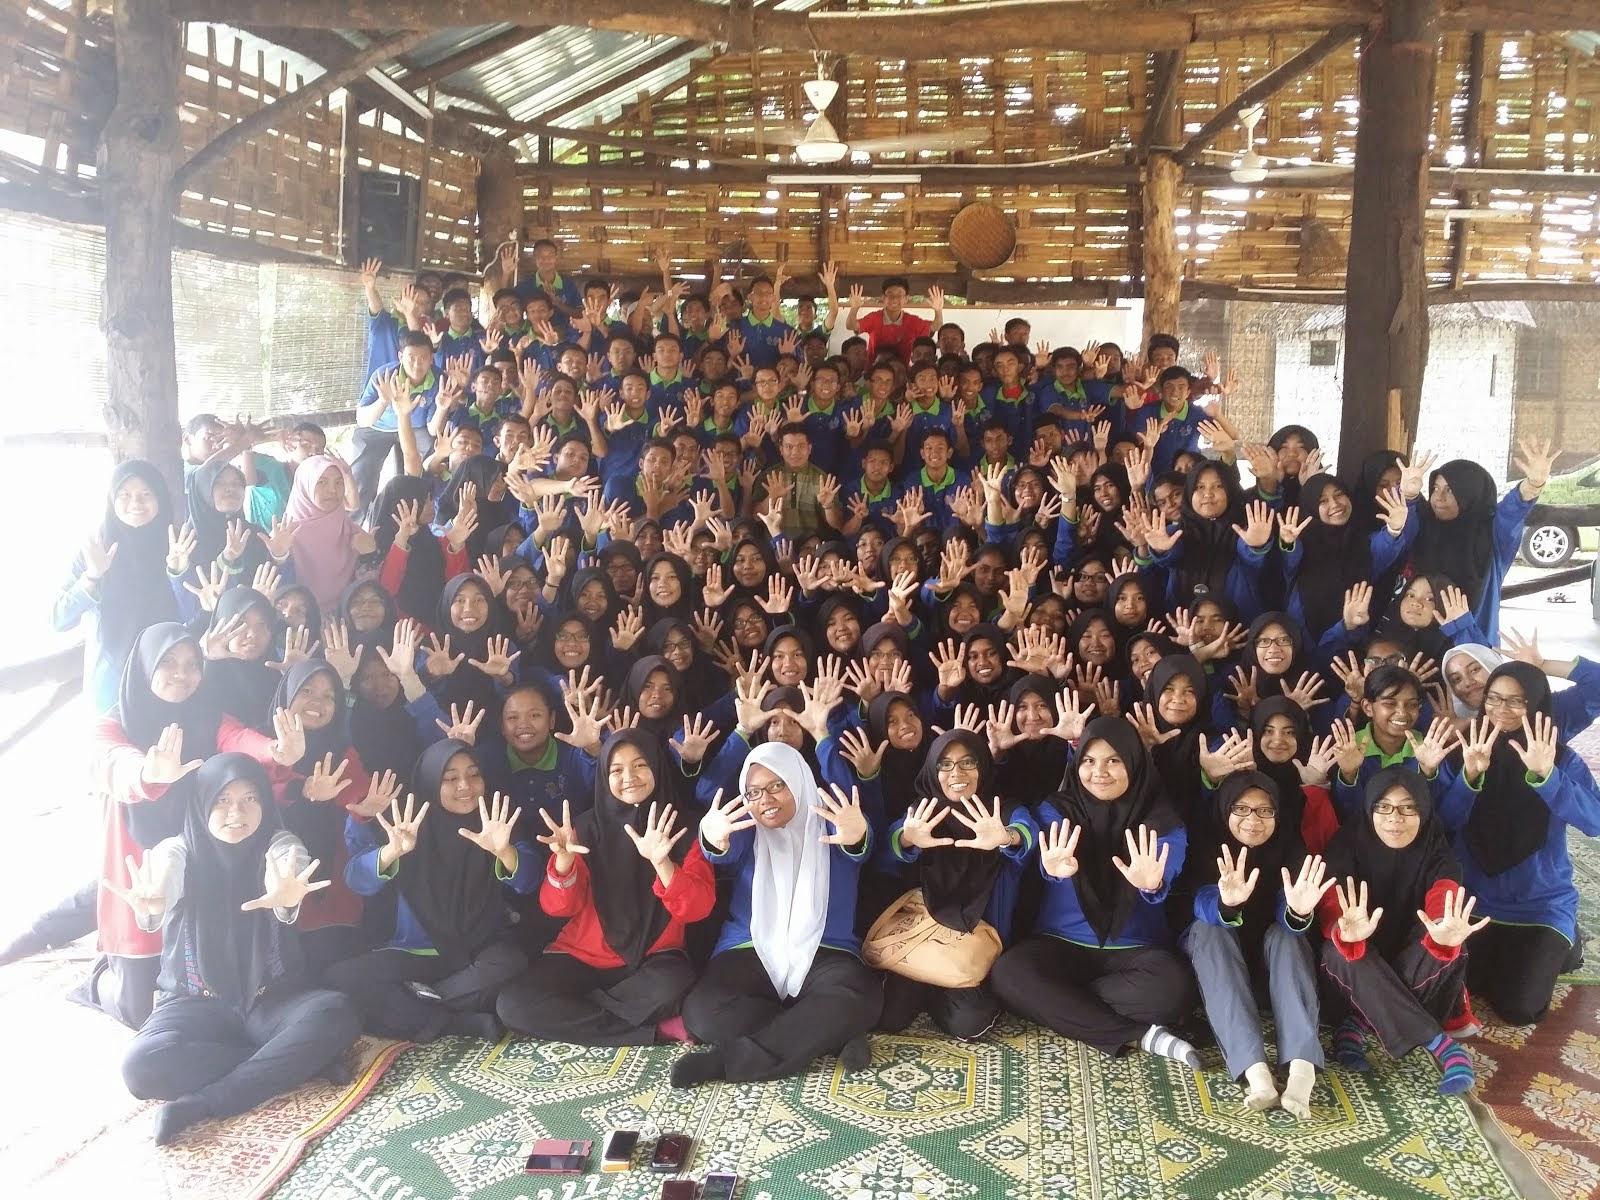 Bersama Form 5 MRSM PDRM 2015